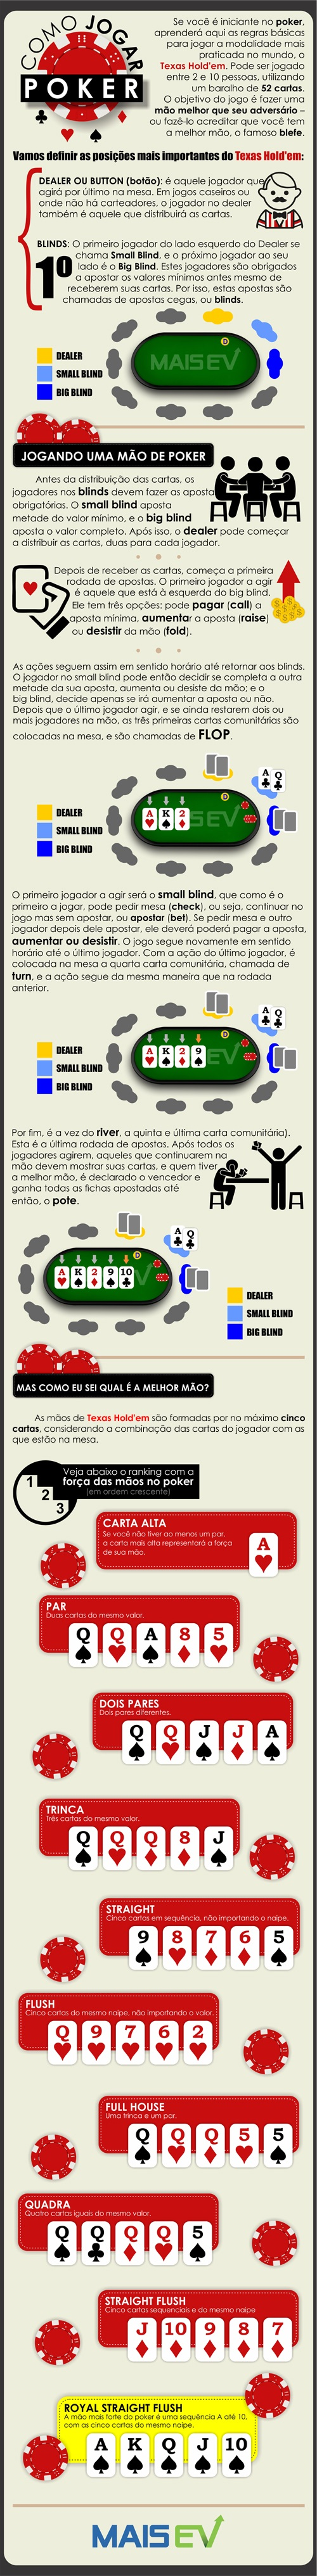 infografico_como_jogar_poker_corrigido